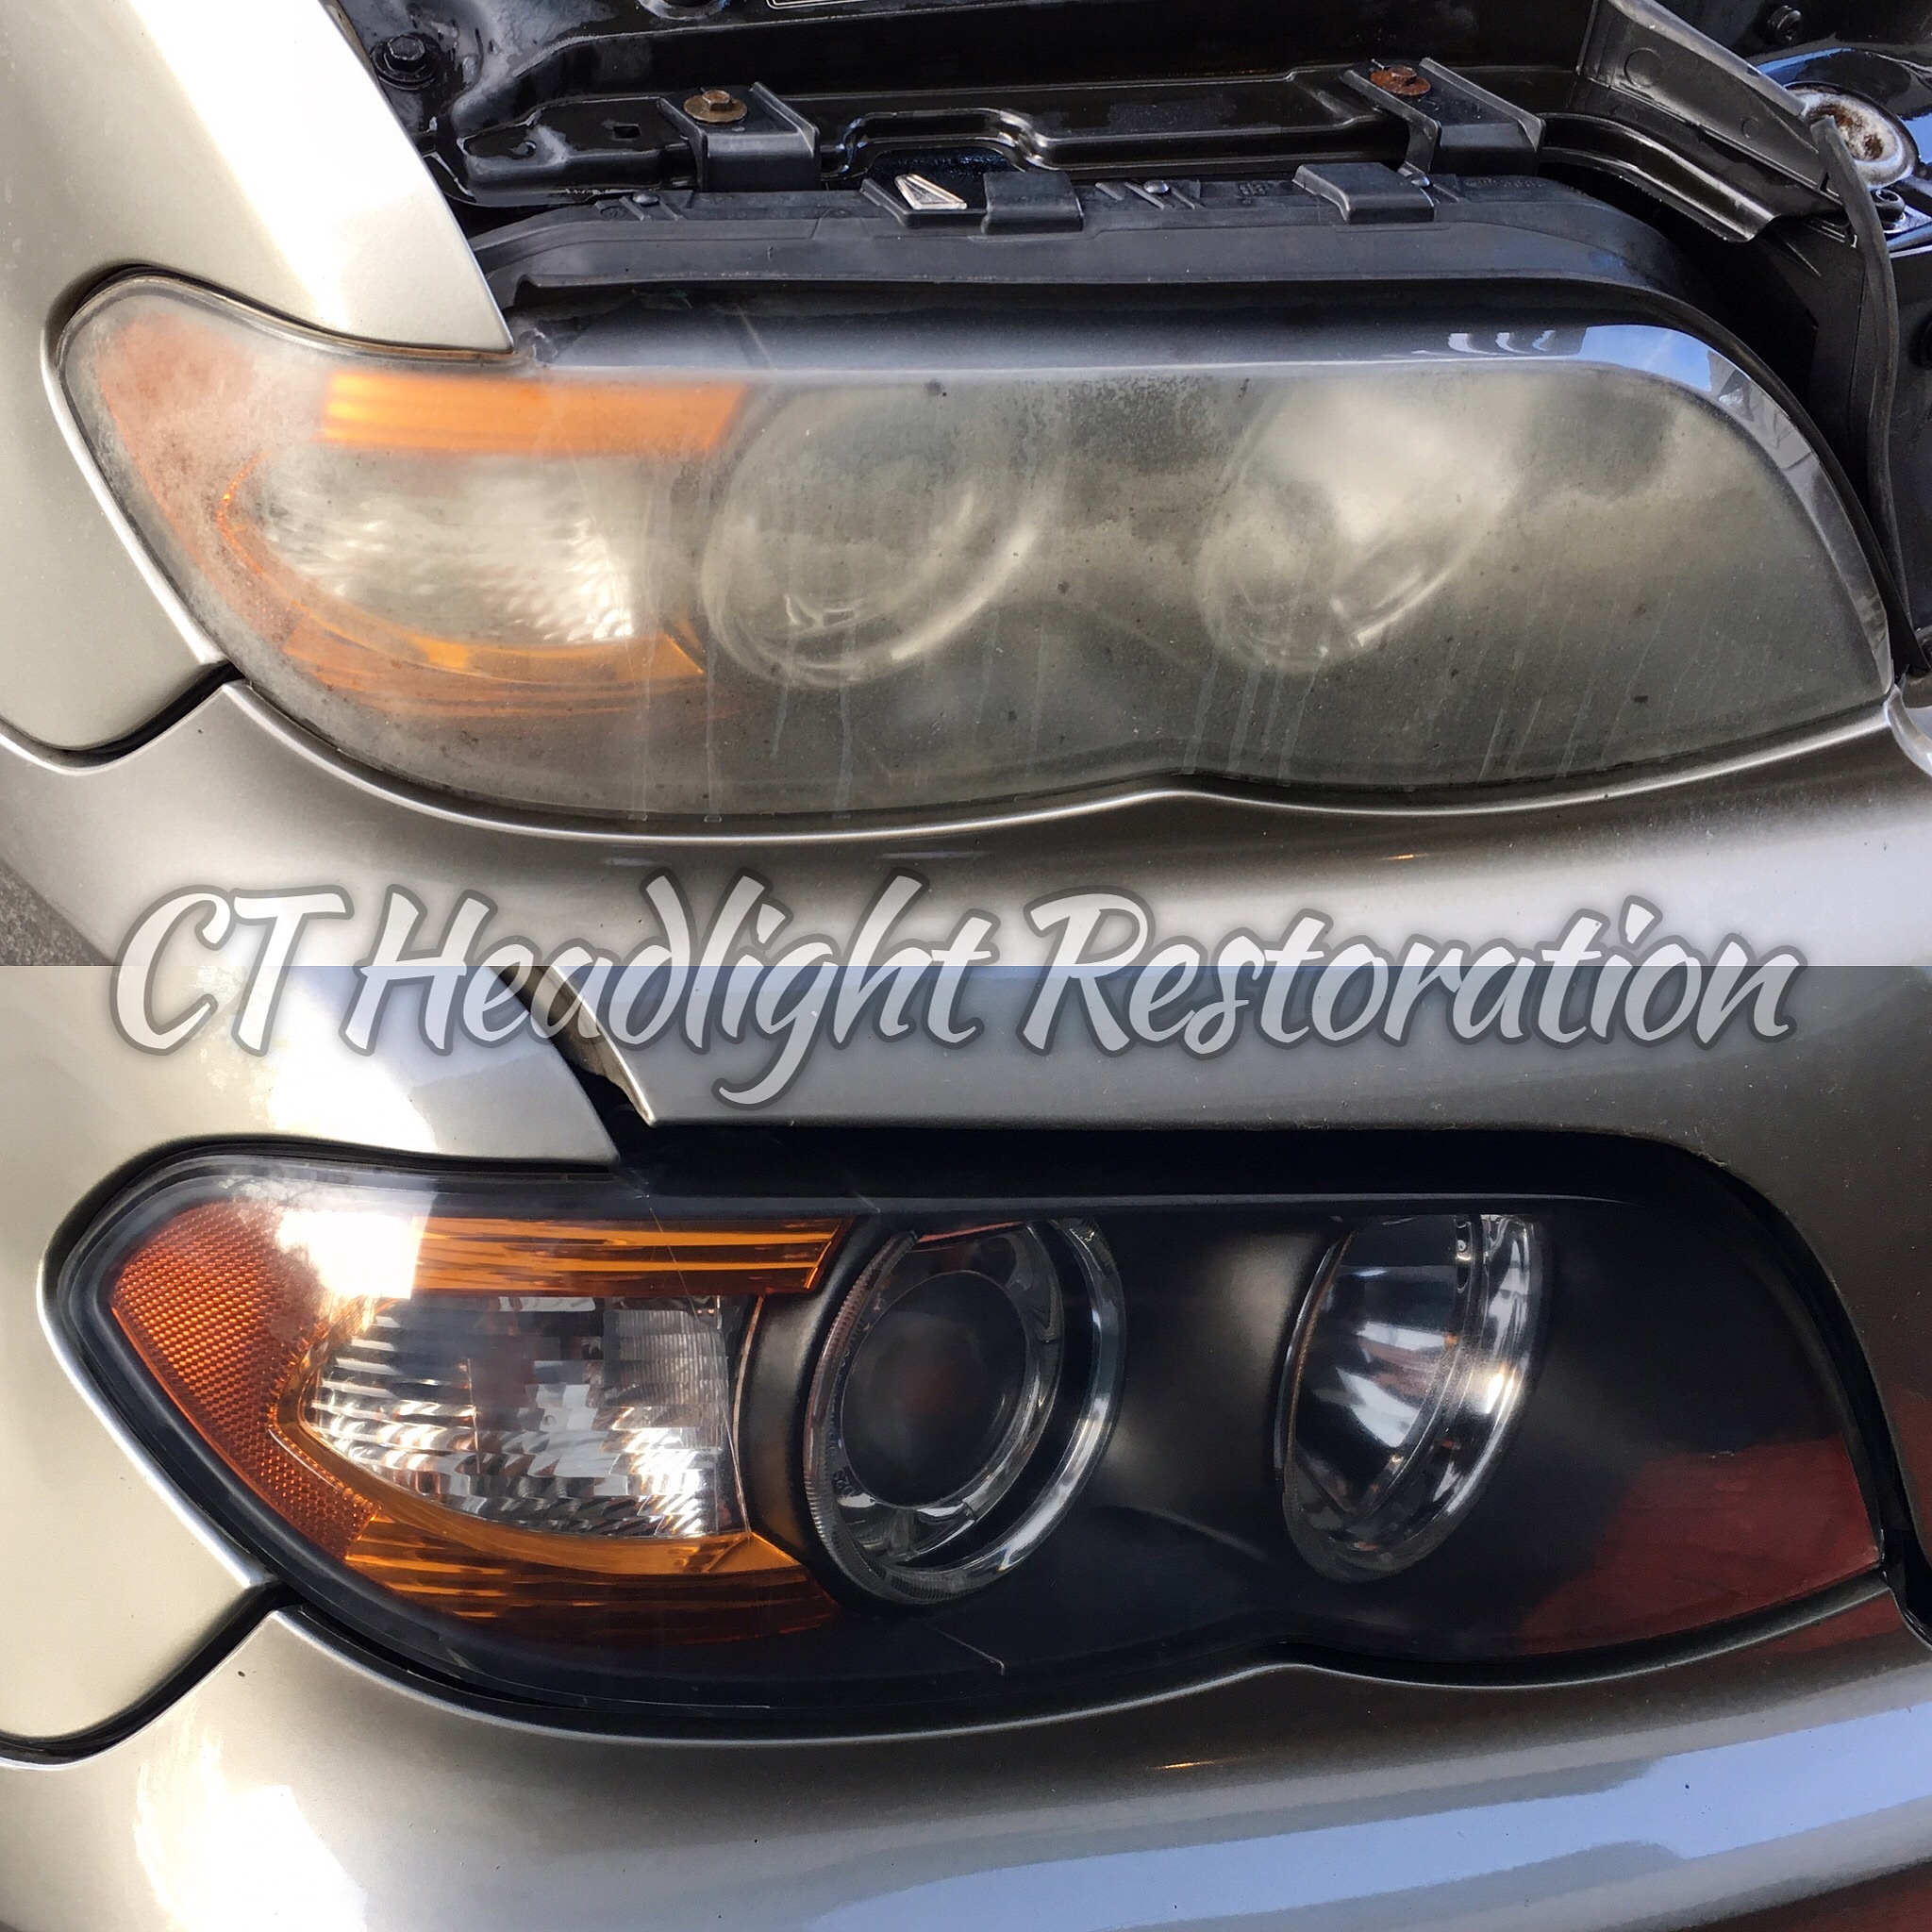 BMW X5 New York Headlight Restoration CT.jpg